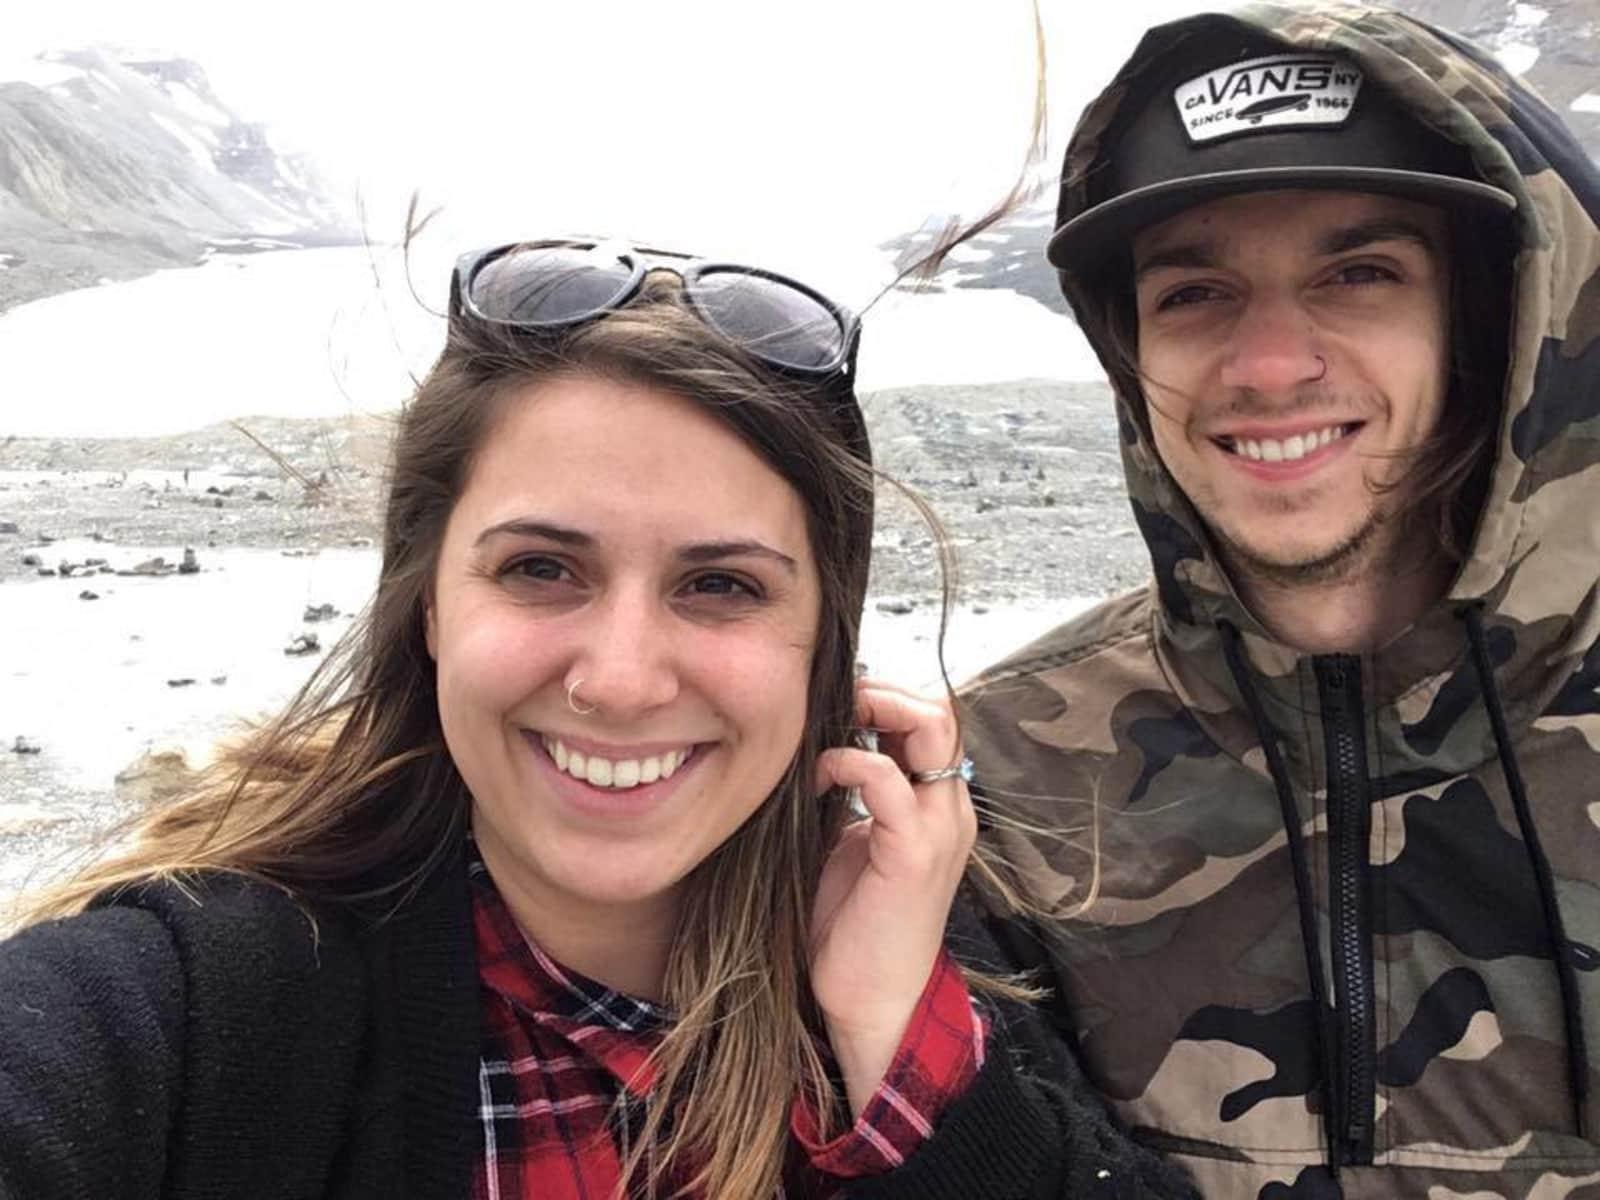 Alexe & Jérémy from Banff, Alberta, Canada